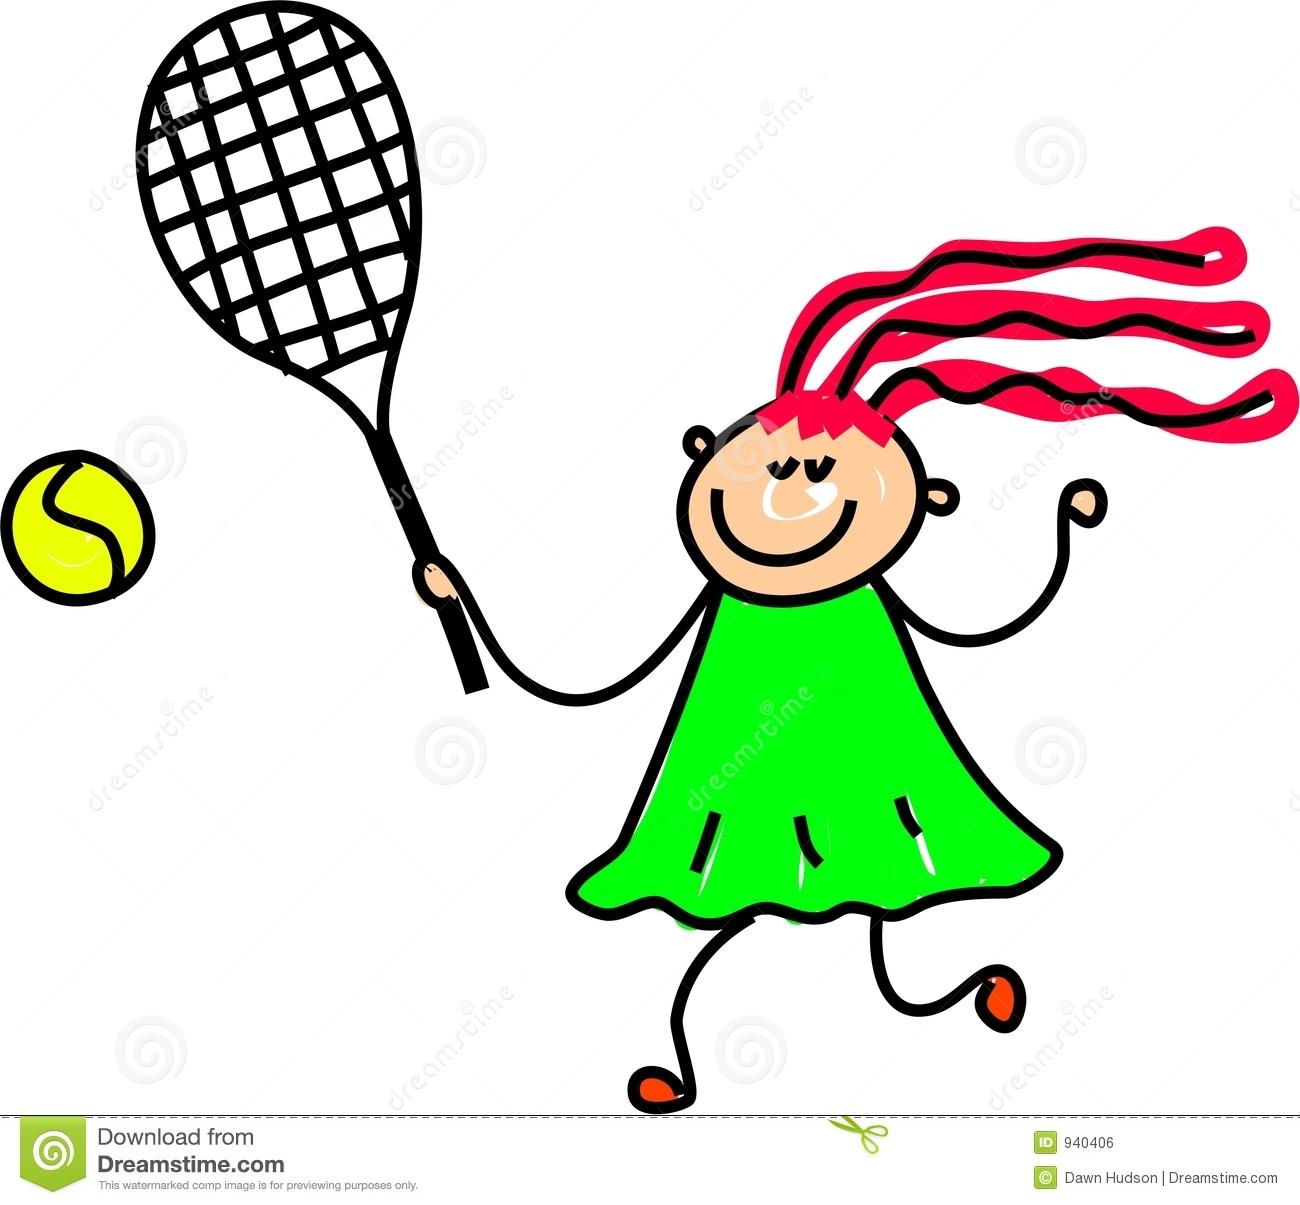 Girl Tennis Clipart Tennis Kid 940406 Jp-Girl Tennis Clipart Tennis Kid 940406 Jpg-4